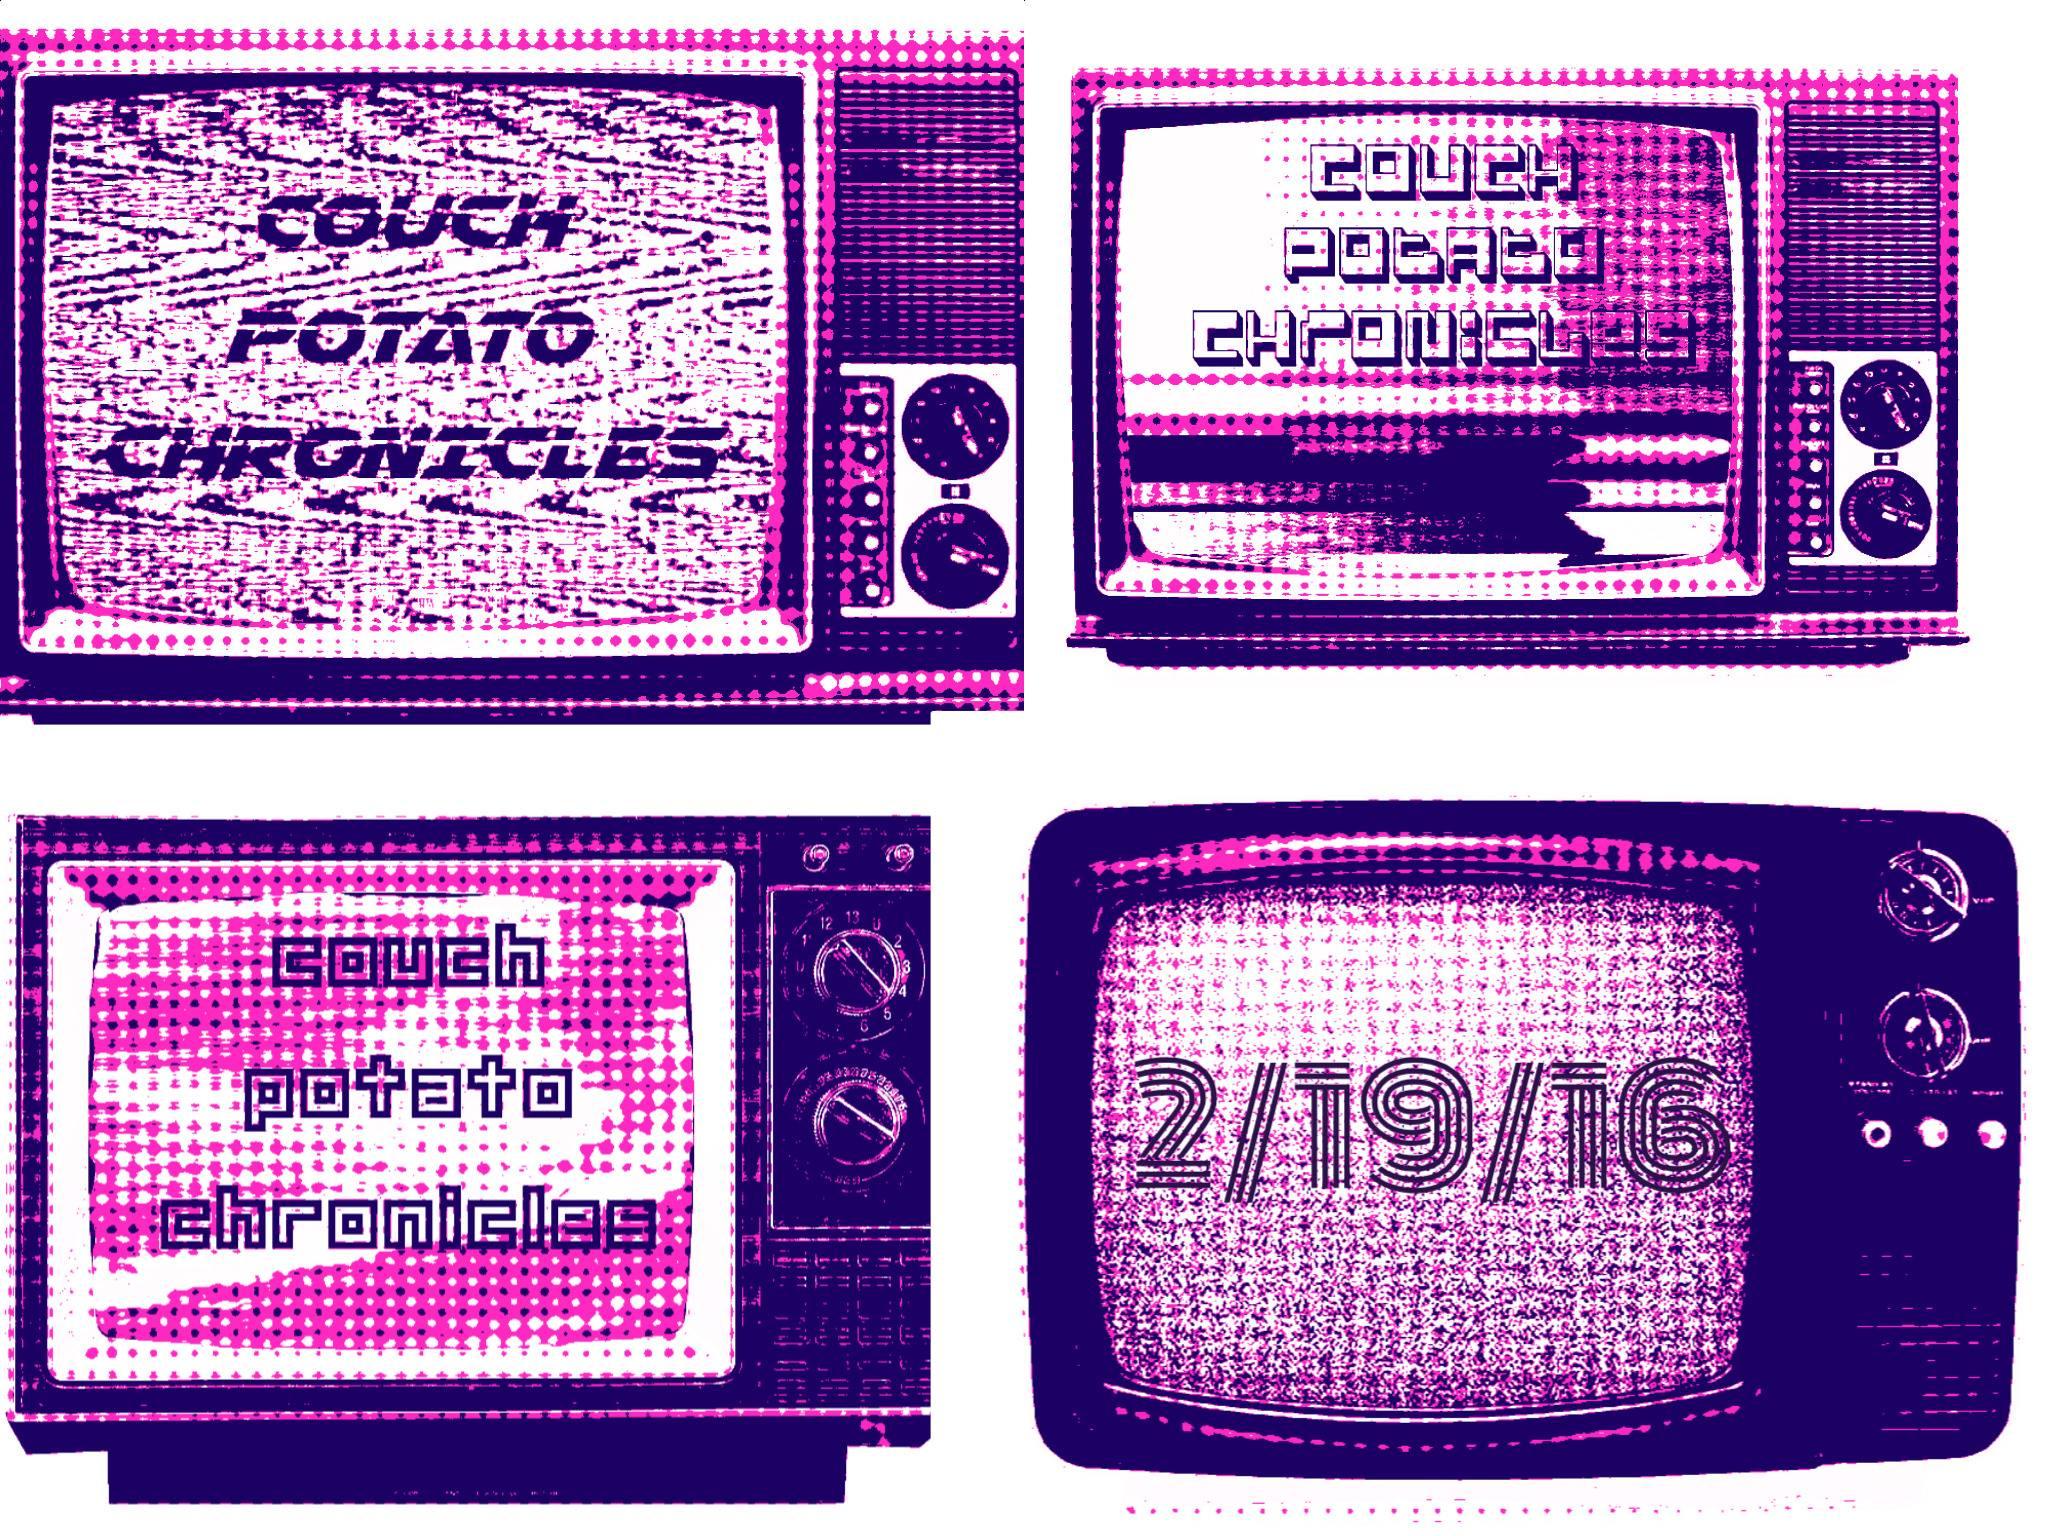 CPC TVs 2.19.16